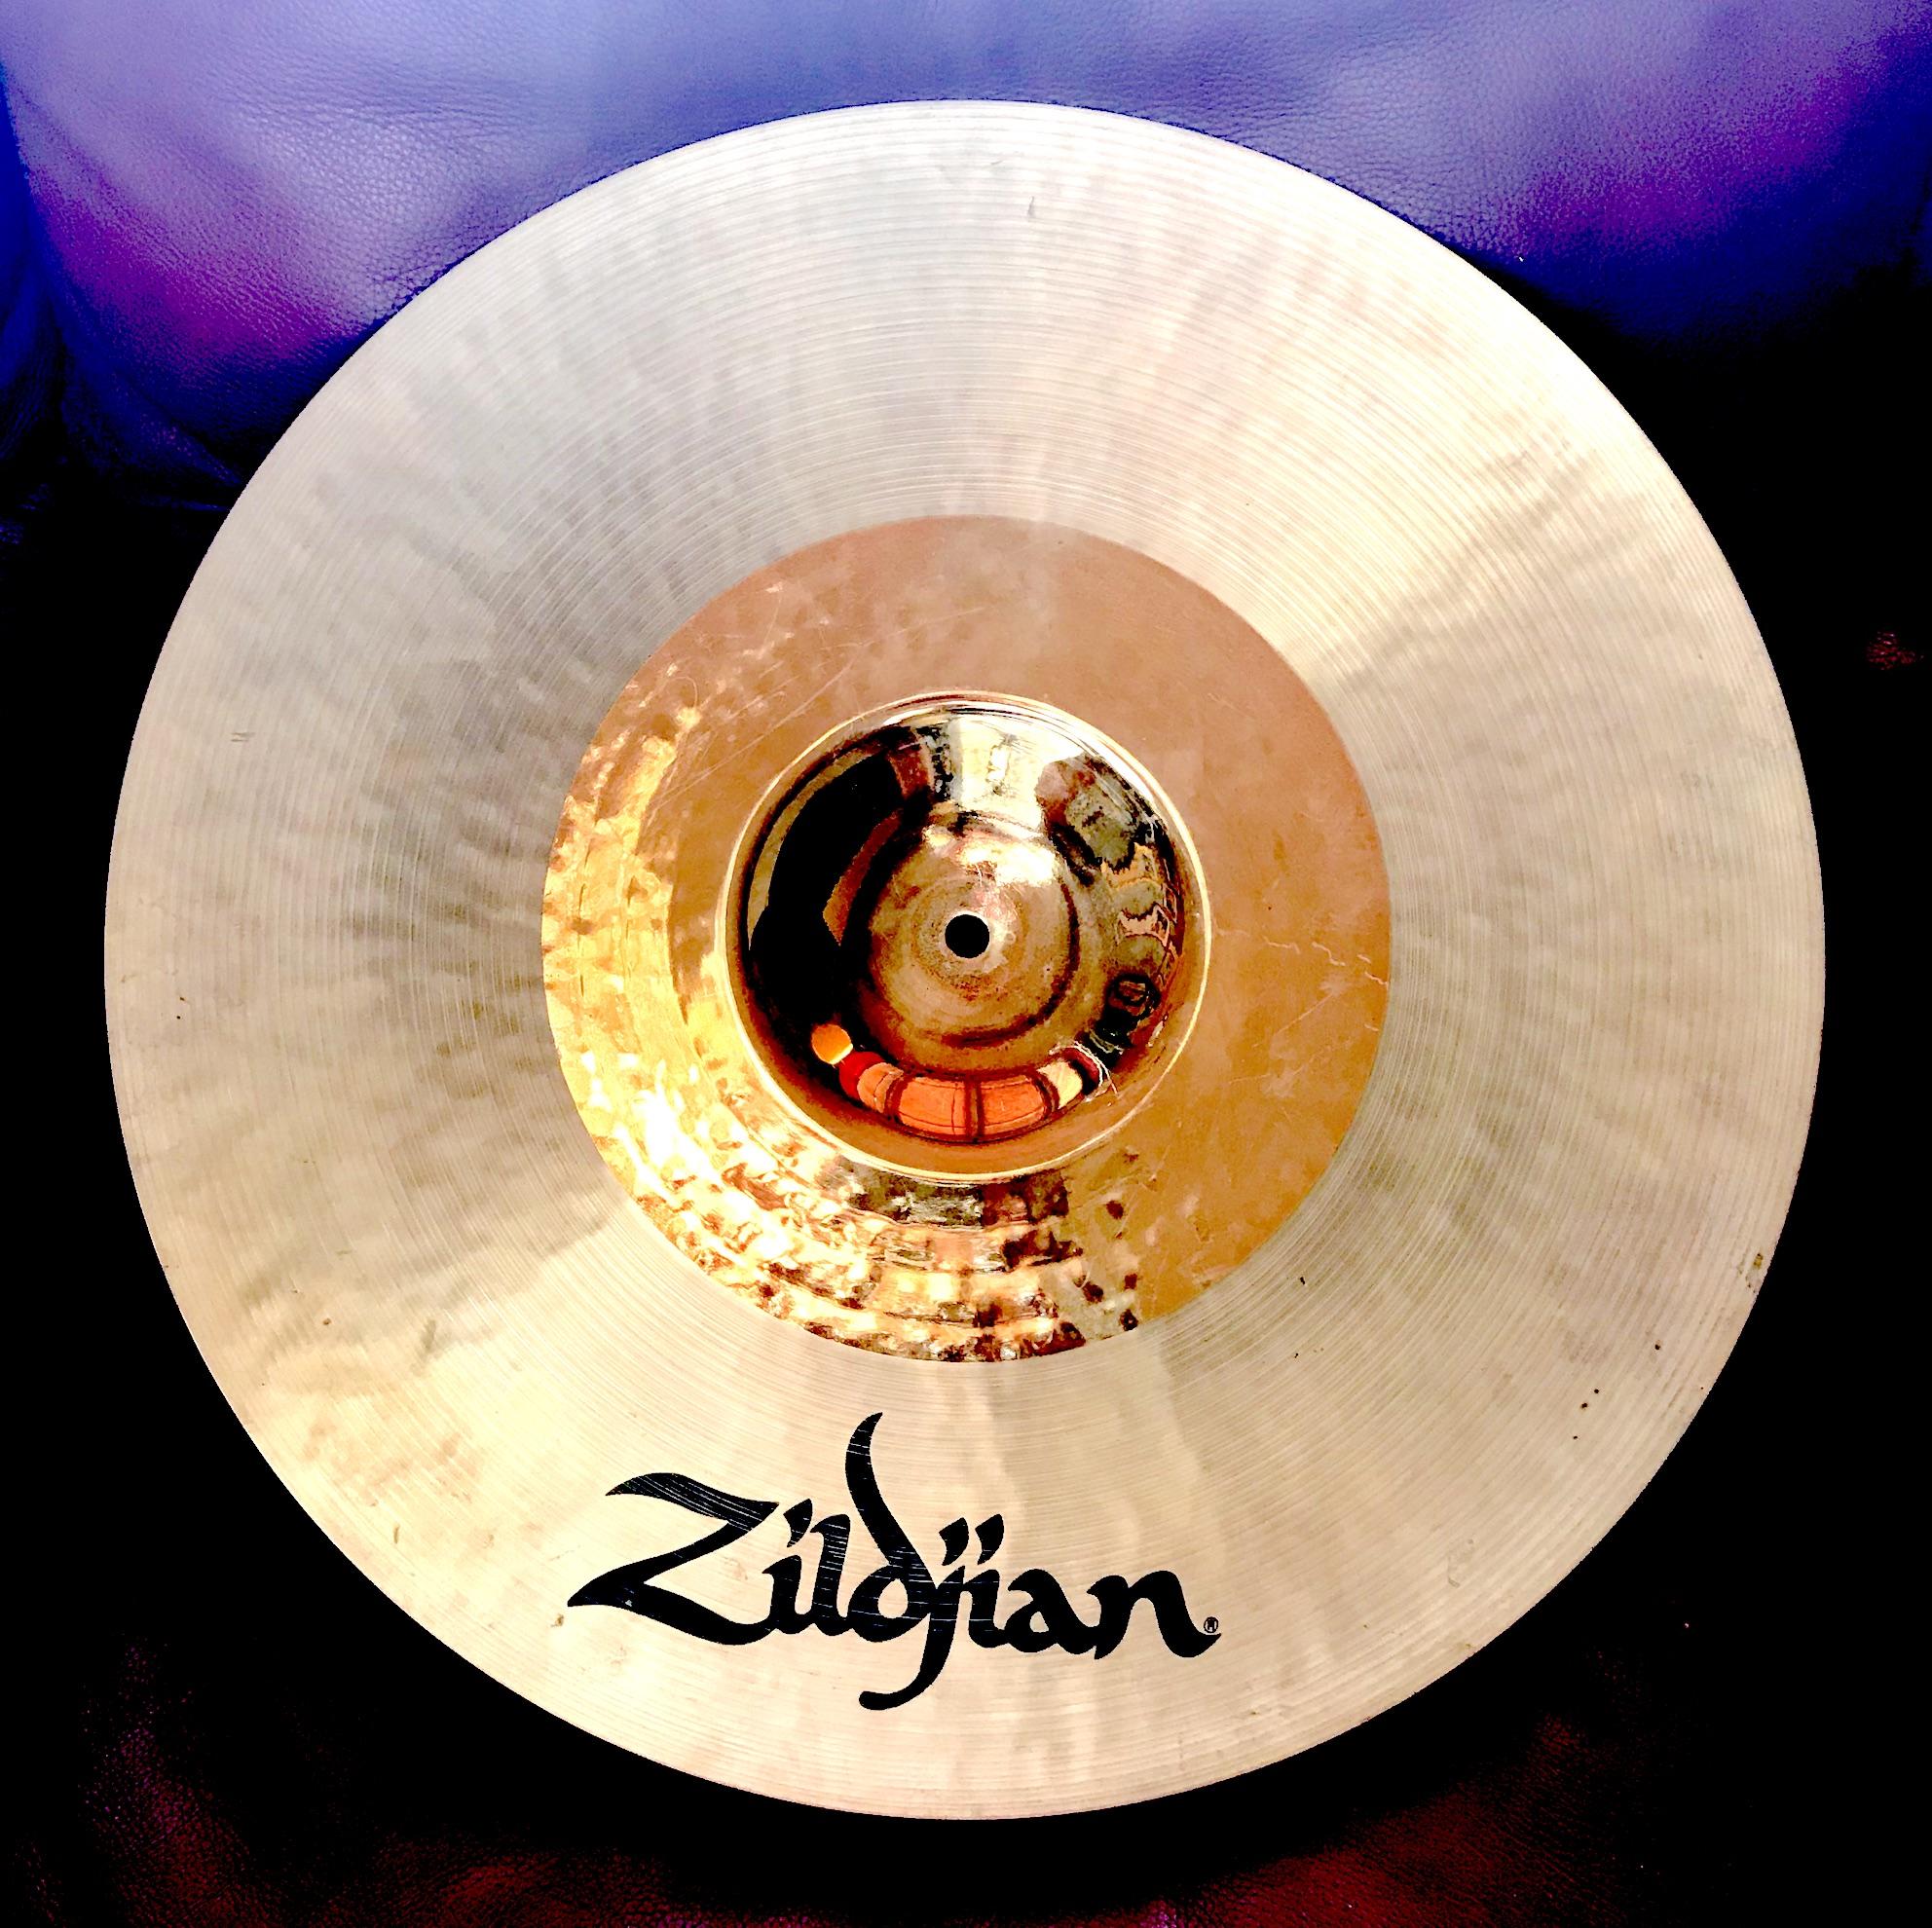 zildjian k custom hybrid ride 20 image 1992842 audiofanzine. Black Bedroom Furniture Sets. Home Design Ideas